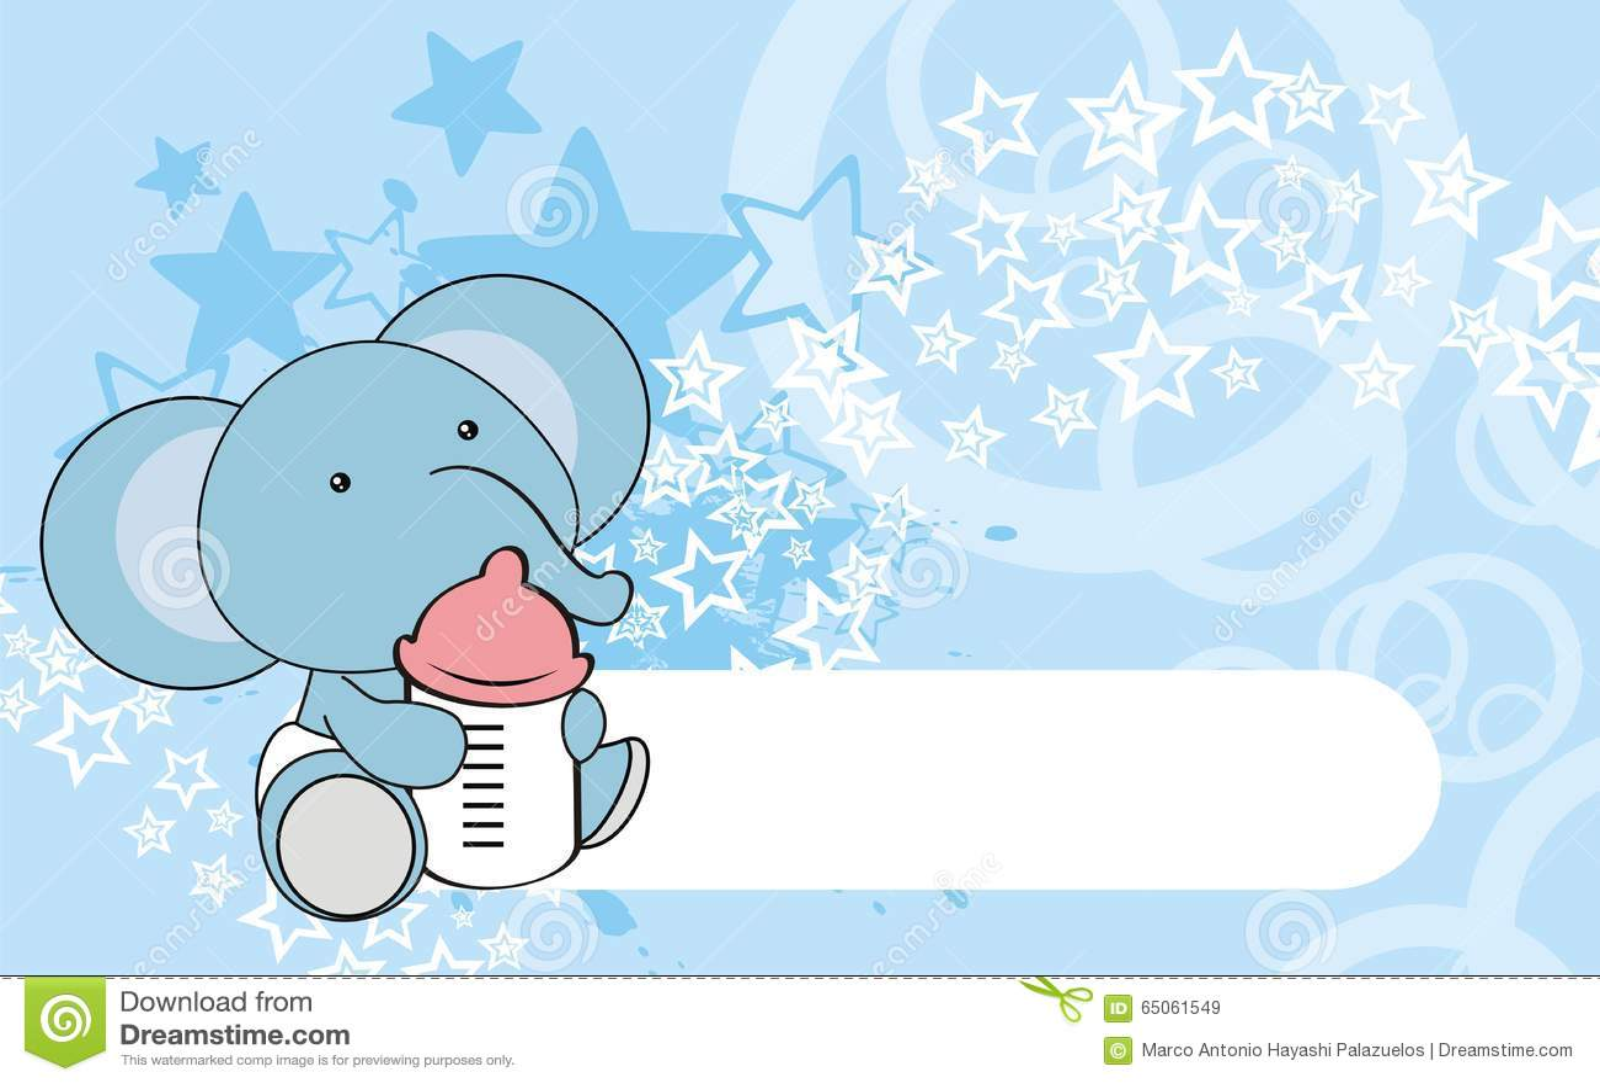 Good Wallpaper Cartoon Elephant - cute-elephant-baby-cartoon-background-animal-vector-format-65061549  Gallery_801392  .jpg